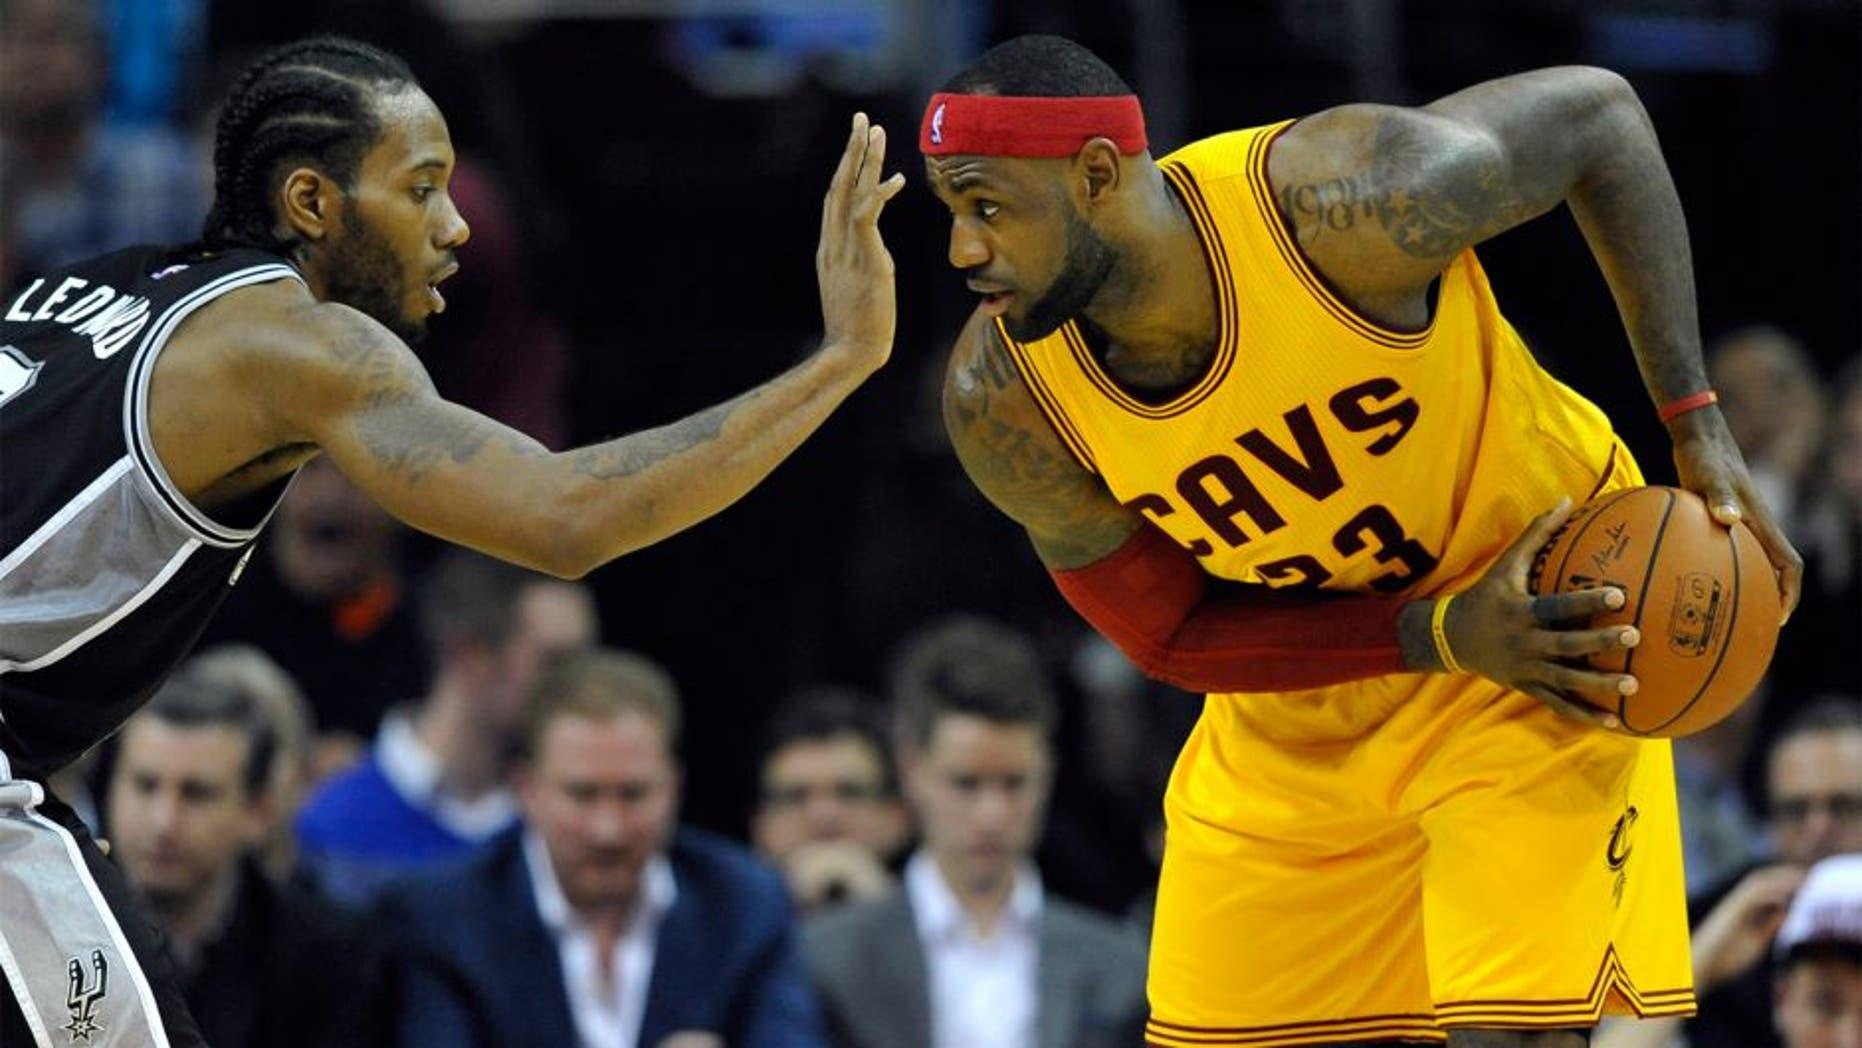 Nov 19, 2014; Cleveland, OH, USA; San Antonio Spurs forward Kawhi Leonard (2) defends Cleveland Cavaliers forward LeBron James (23) in the third quarter at Quicken Loans Arena. Mandatory Credit: David Richard-USA TODAY Sports